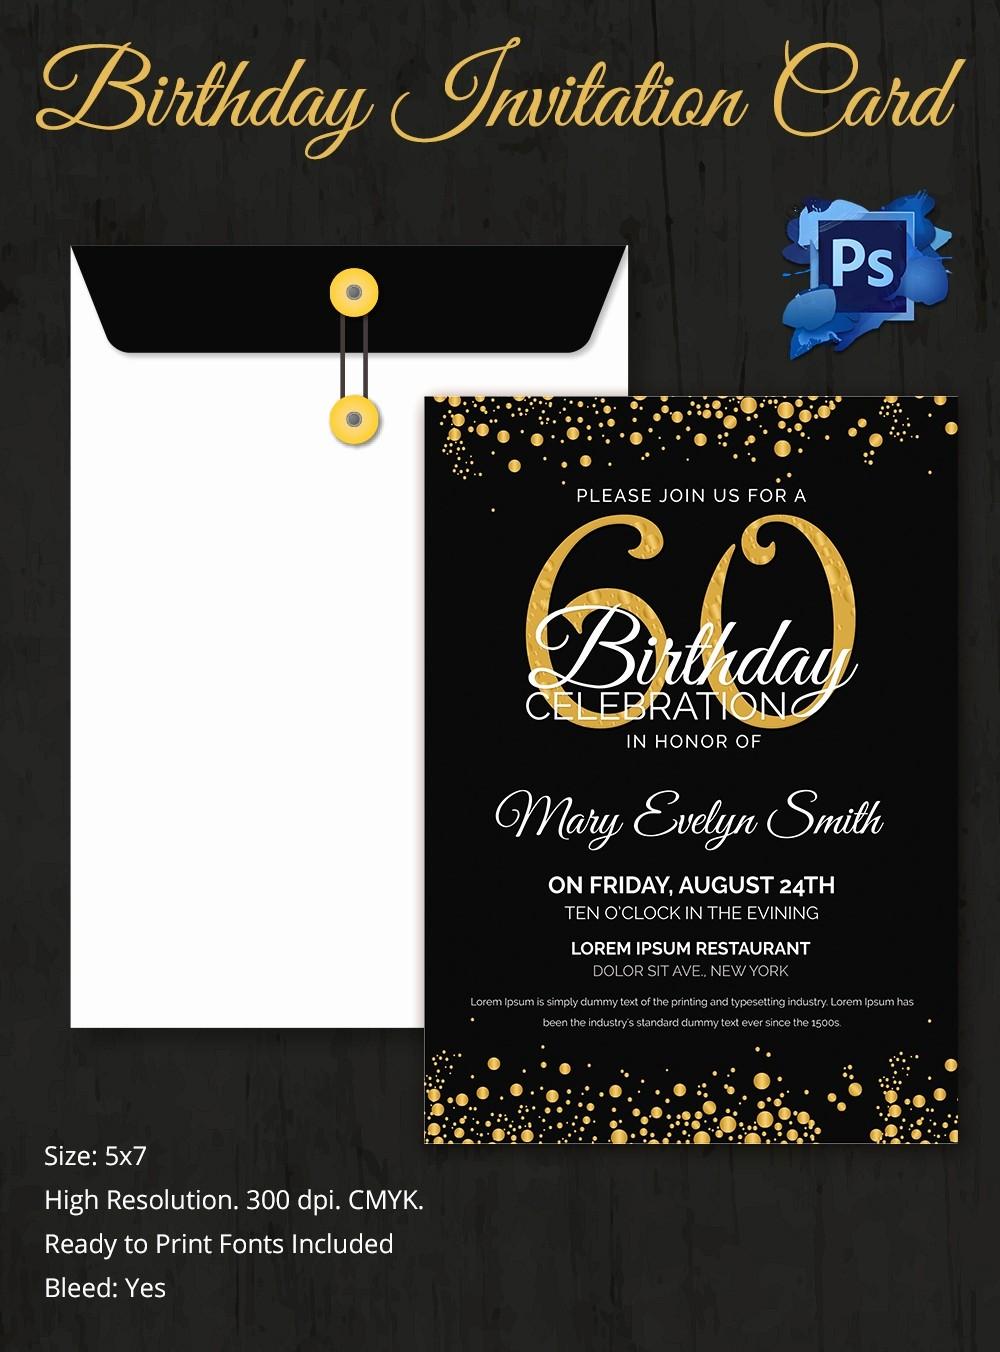 Free Templates for Birthday Invitations Inspirational Birthday Invitation Template 32 Free Word Pdf Psd Ai